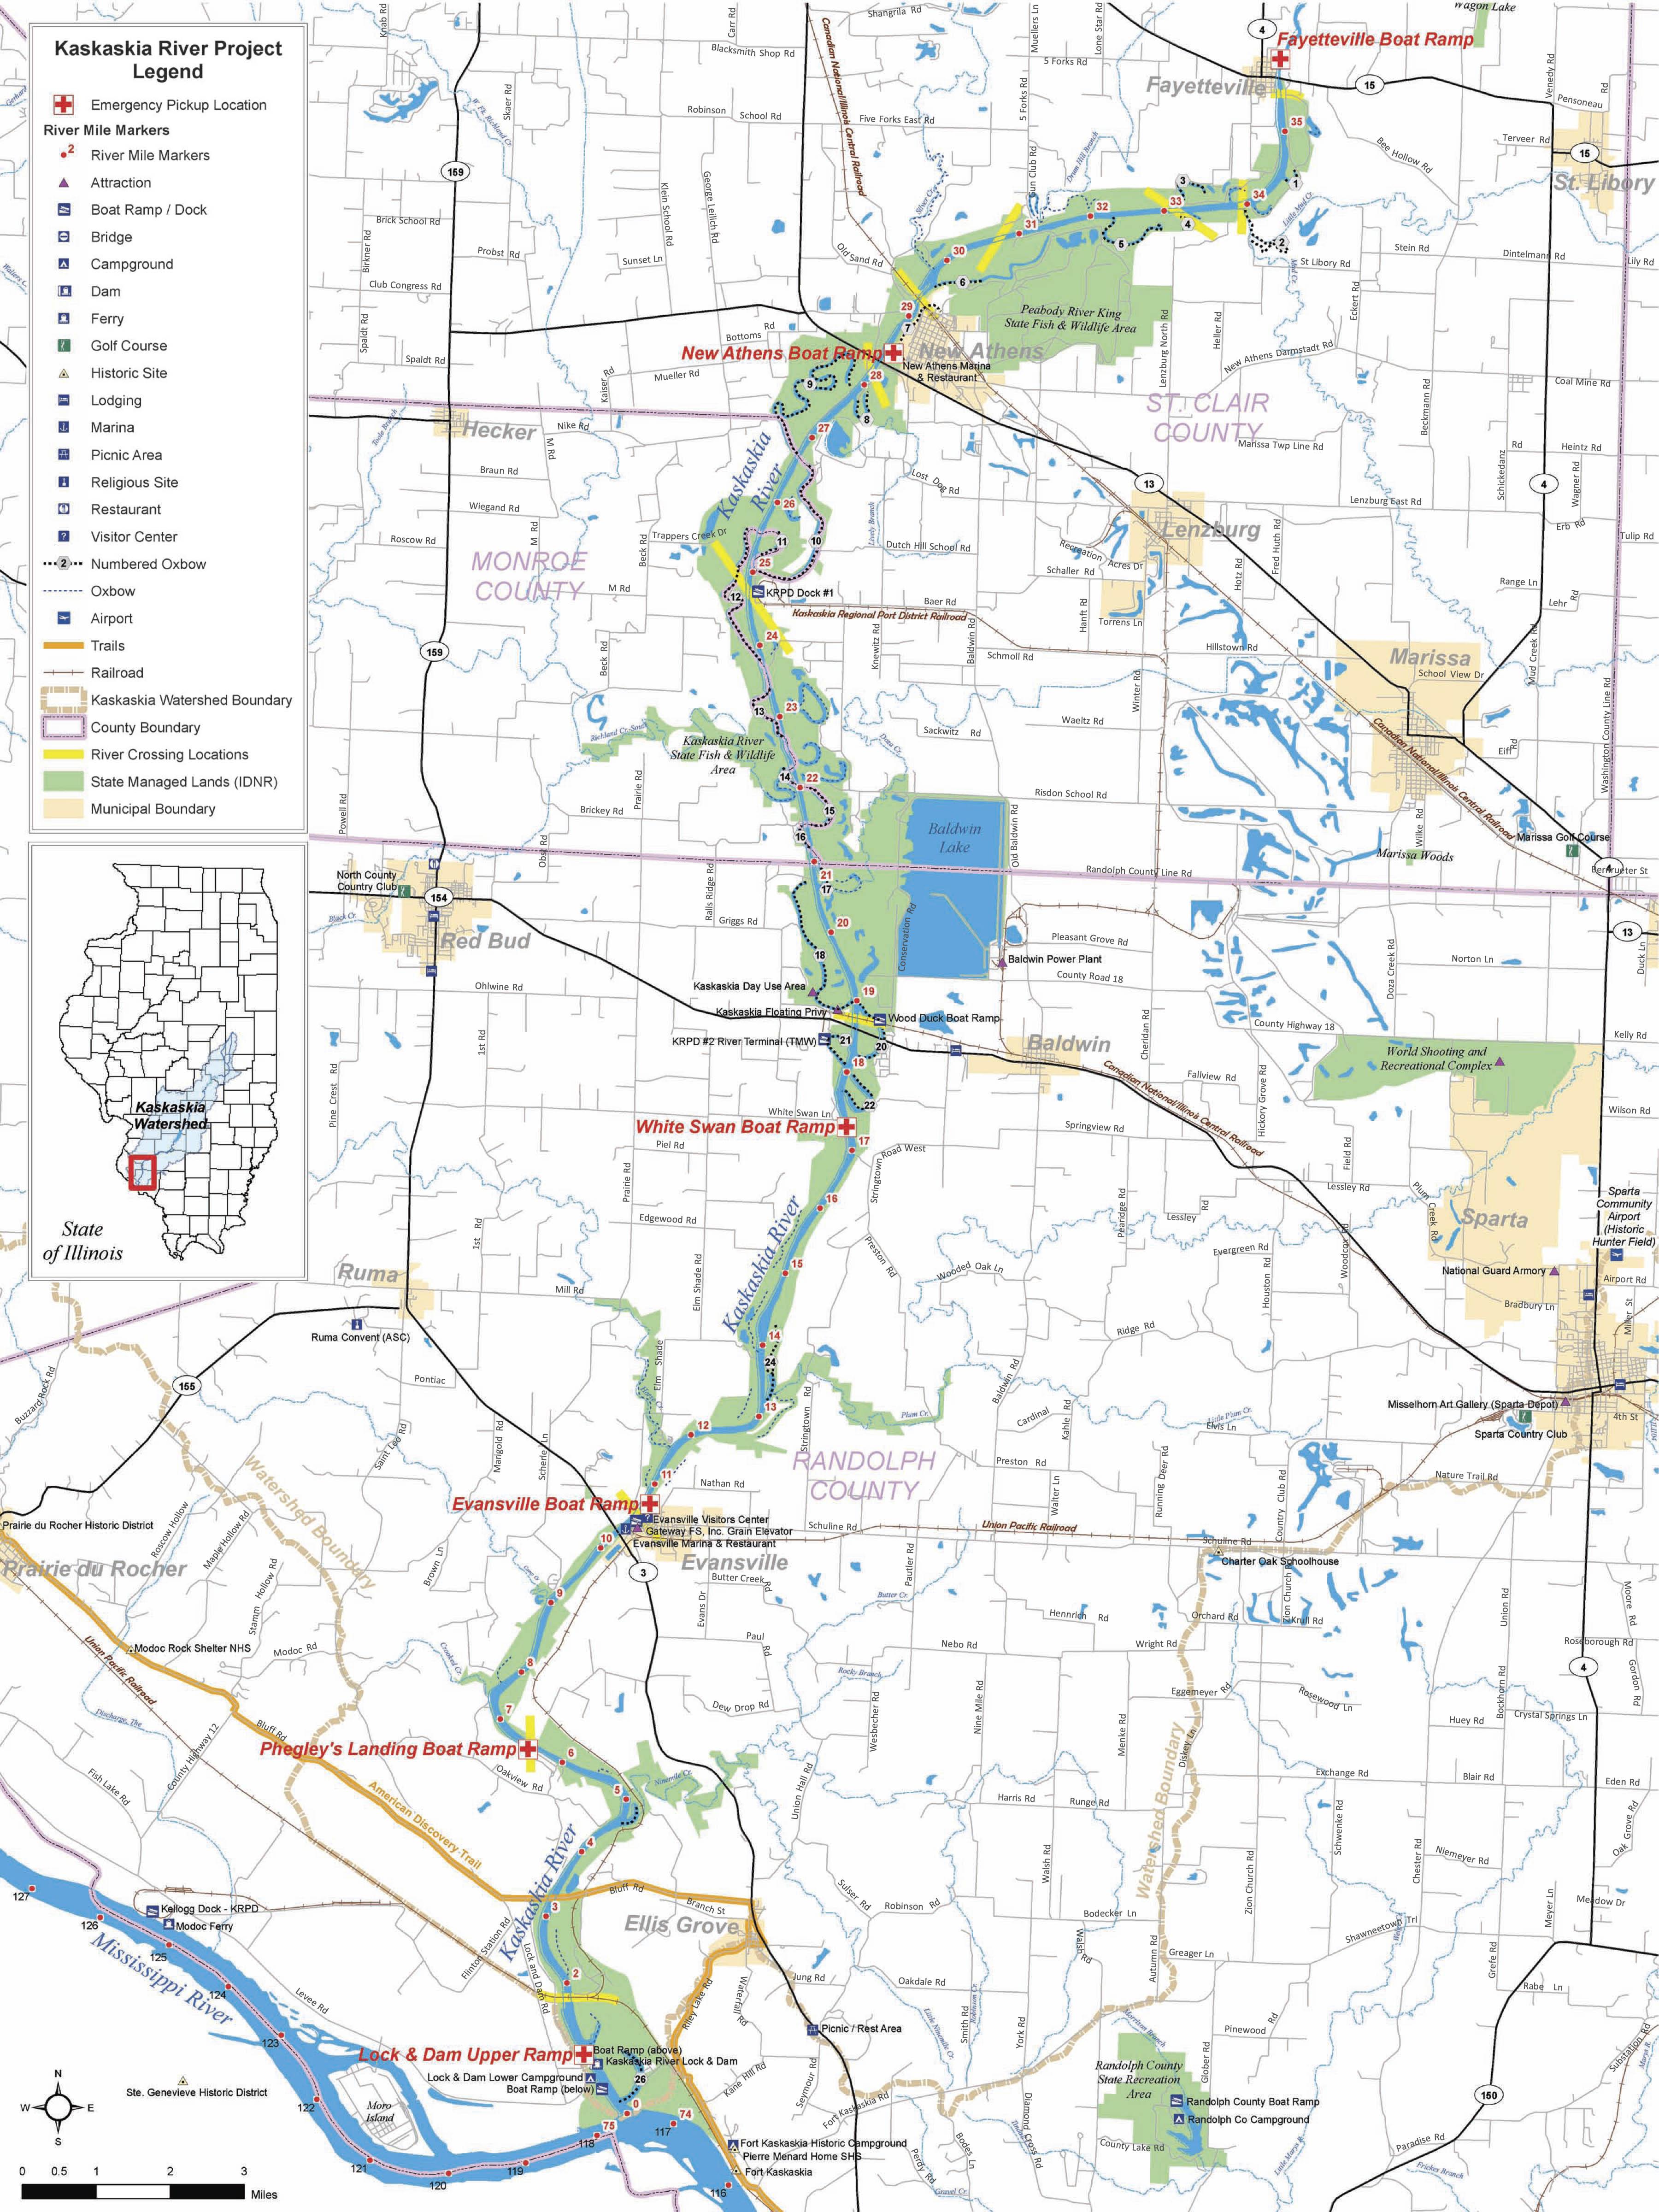 Illinois randolph county baldwin - Http Www Mvs Usace Army Mil Portals 54 Docs Recreation Kaskaskia Krpmapsidewroadssmaller Jpg